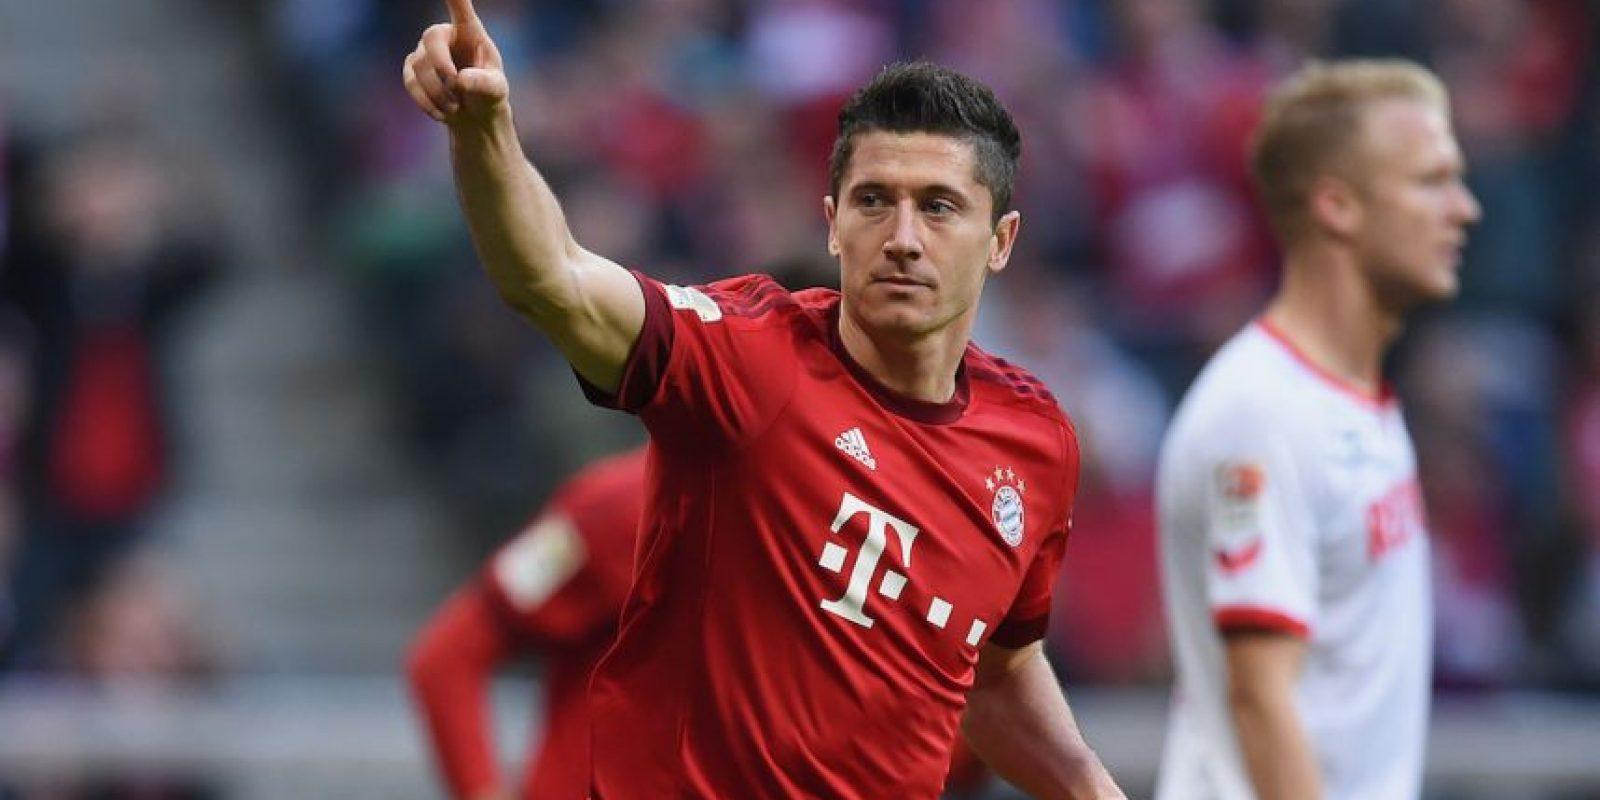 9. Robert Lewandowski / 70 millones de euros. Foto:Getty Images